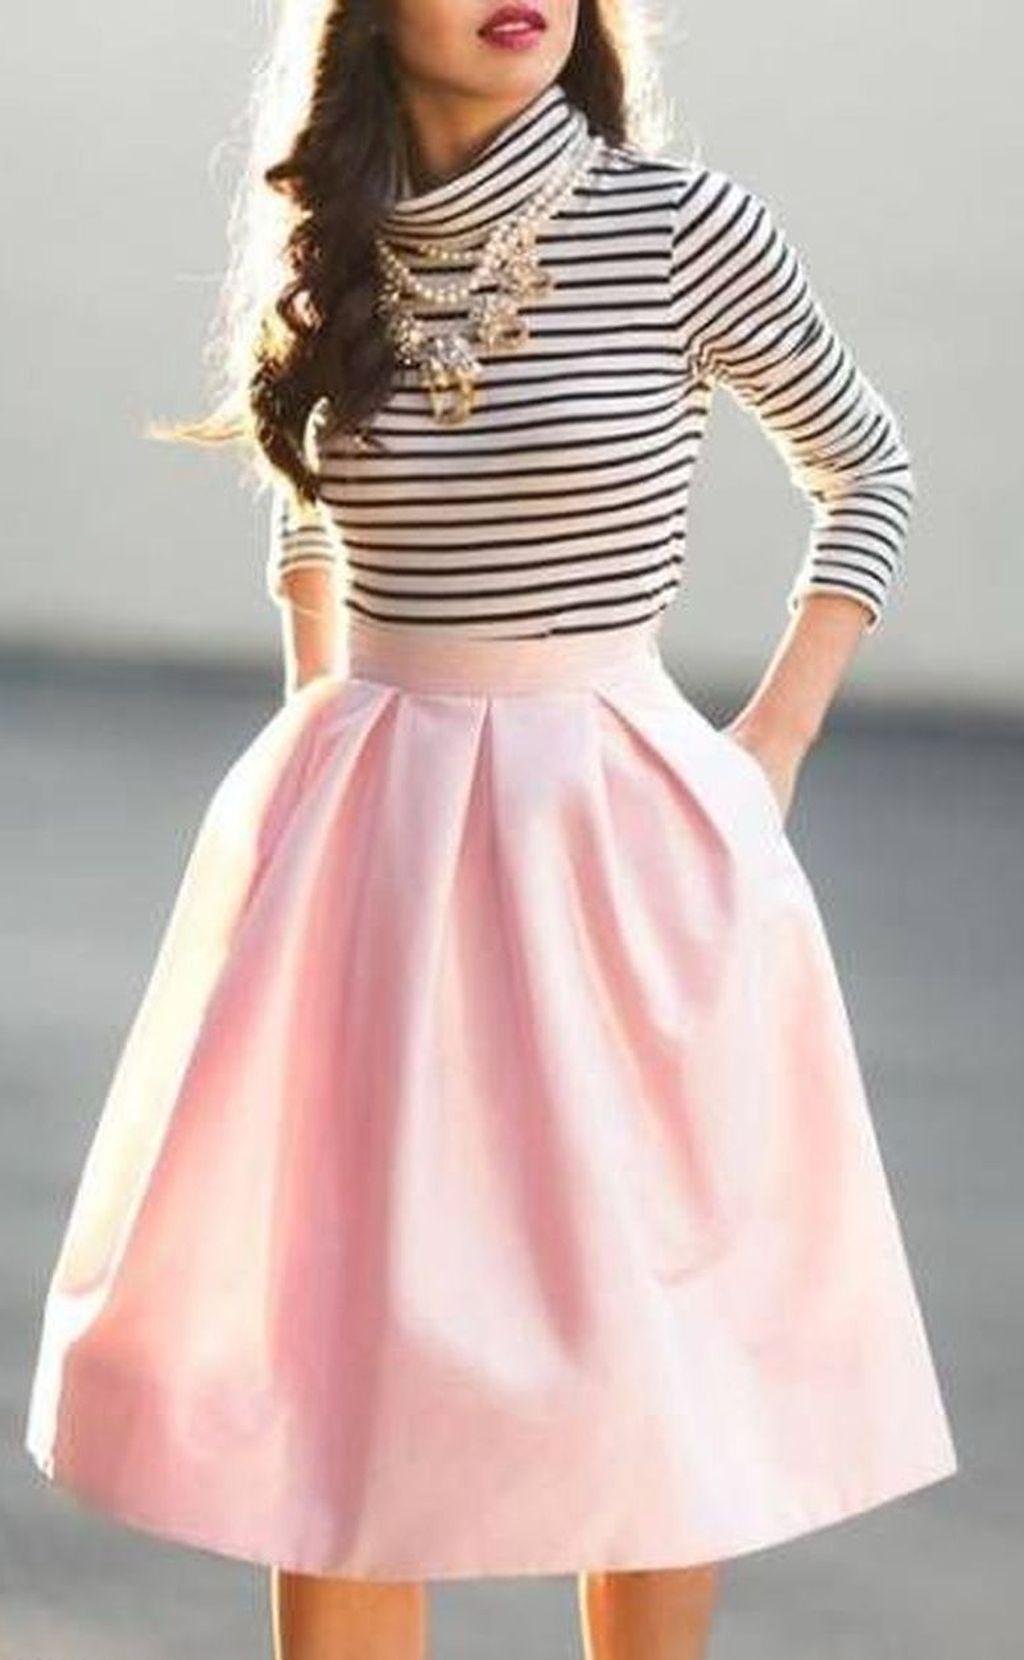 Dress & Outfits #love #desigirls #bhayankar #photography #suparhit #shootout #bikini #mumbai #sexygirl #hotgirl #kolkata #photooftheday #kurti #festivalfashion #instadaily #navel #cutegirl #durgapuja #choice #festival #tamilgirl #tamil #ig #models #igers #jaipur #fashionphotography #schoolgirl #quadzilla #sareeindia #mittellangeröcke